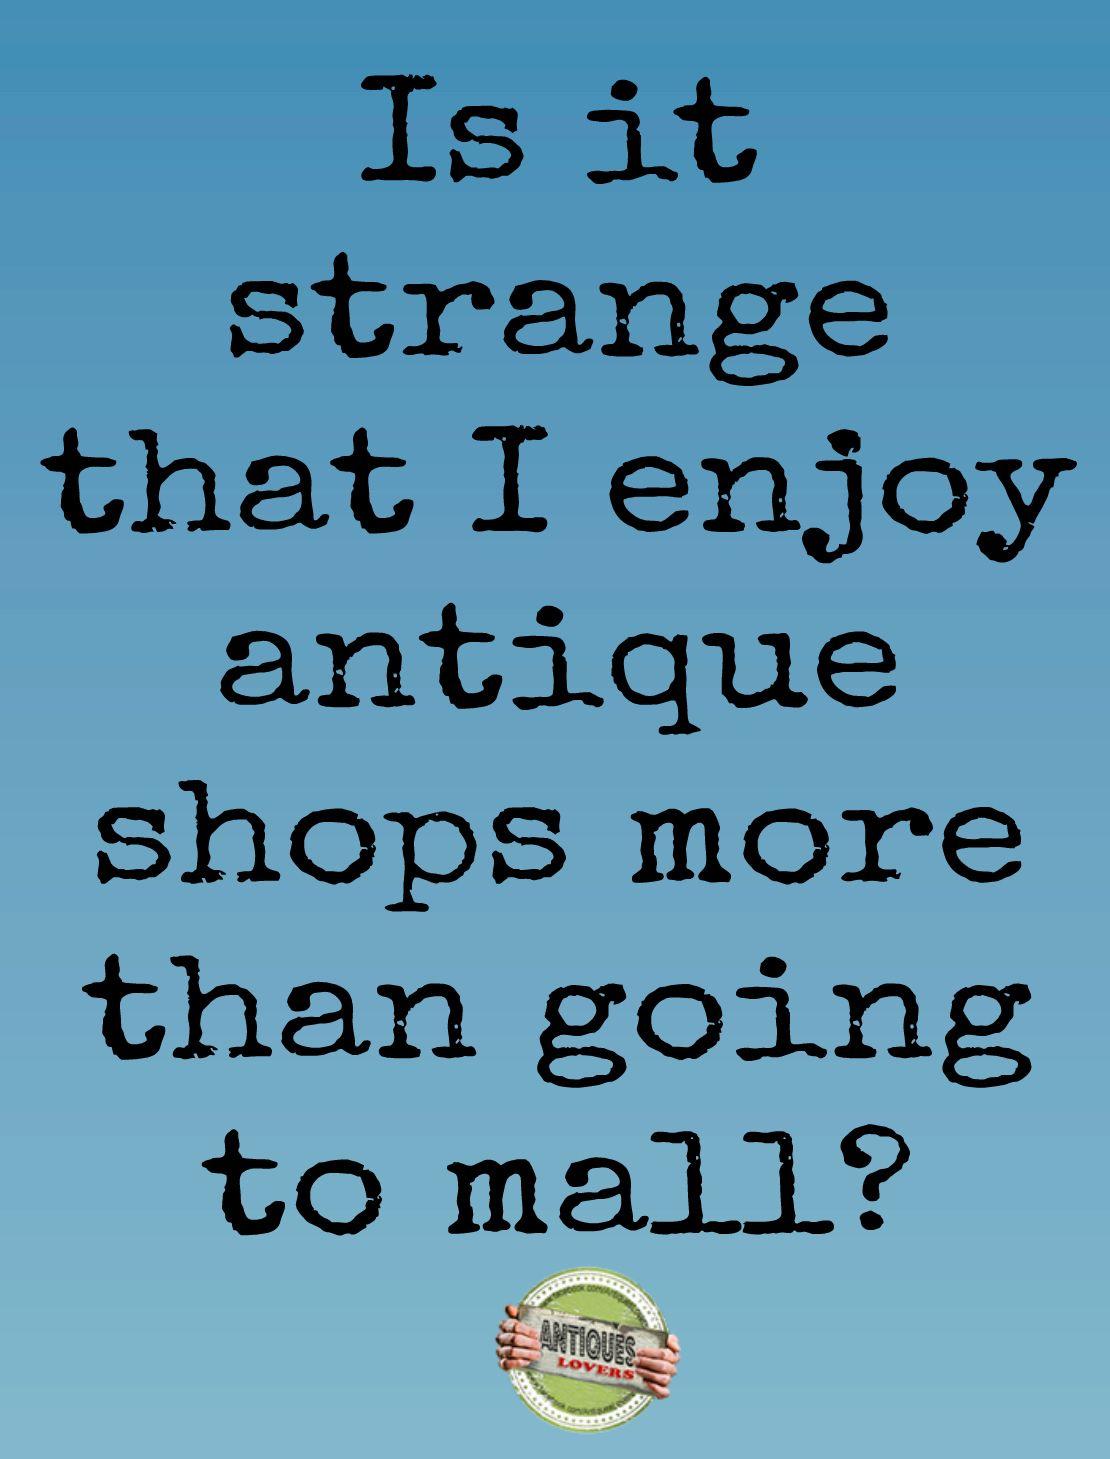 Antiques Lovers Facebook Quotes Top 5 Antique Shops VS